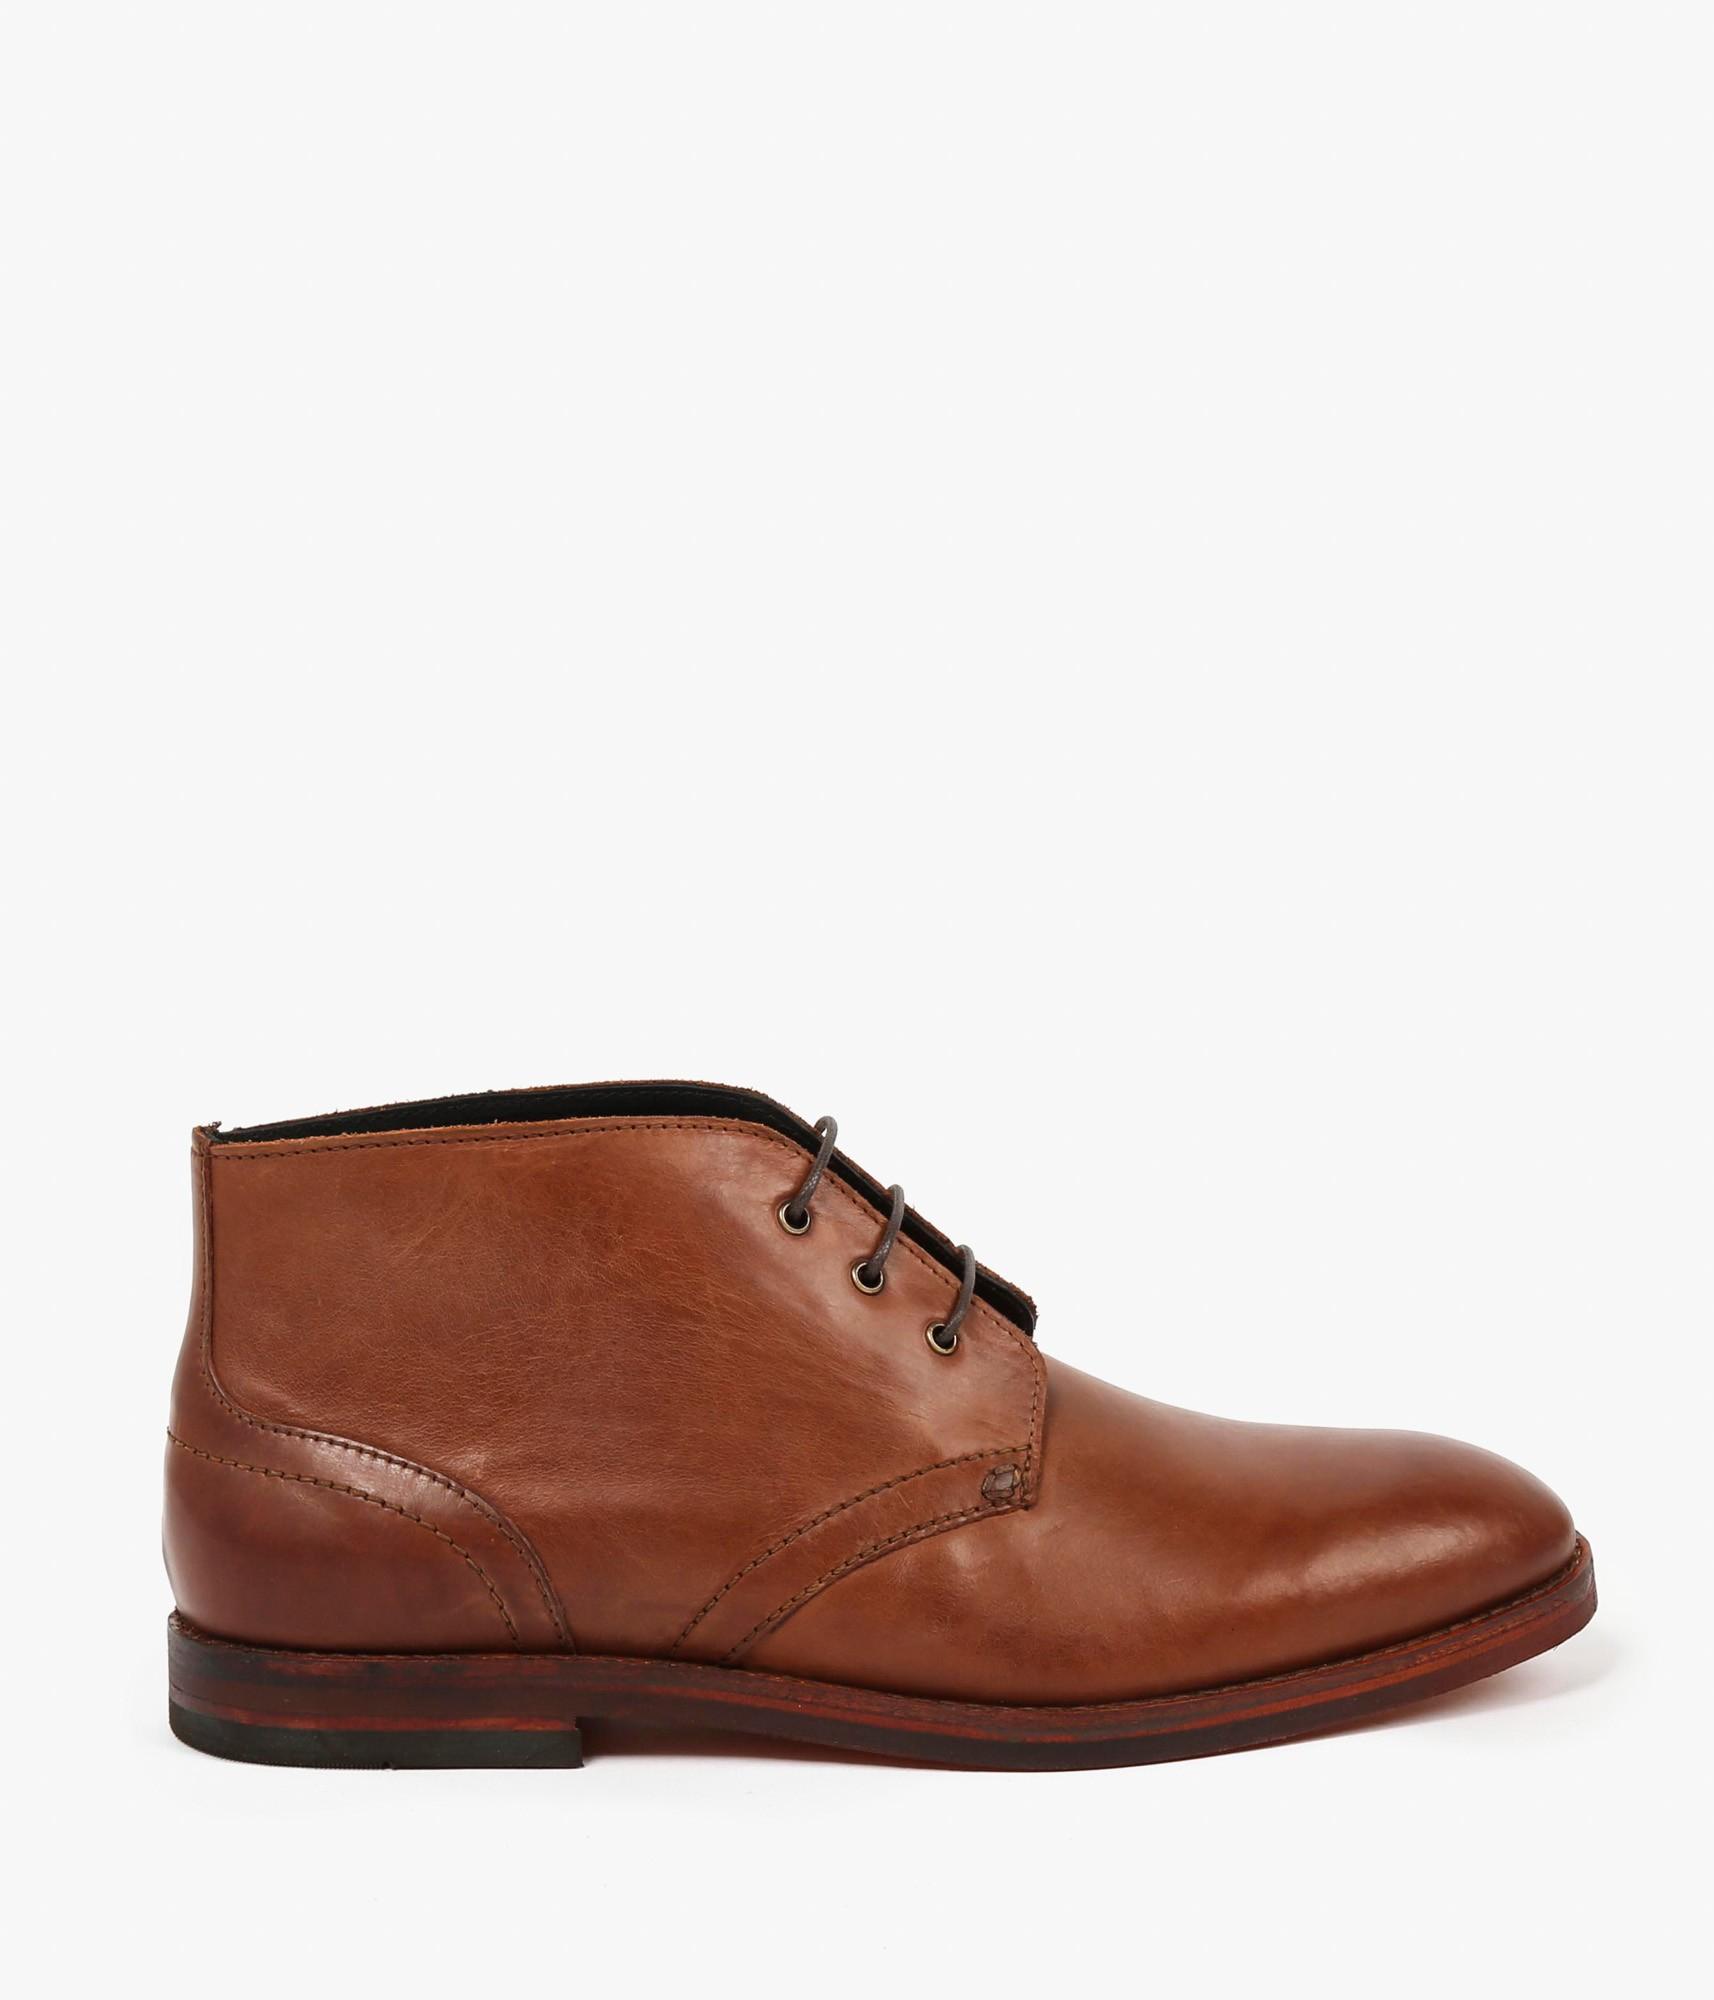 h by hudson houghton 2 shoes in brown for men tan lyst. Black Bedroom Furniture Sets. Home Design Ideas